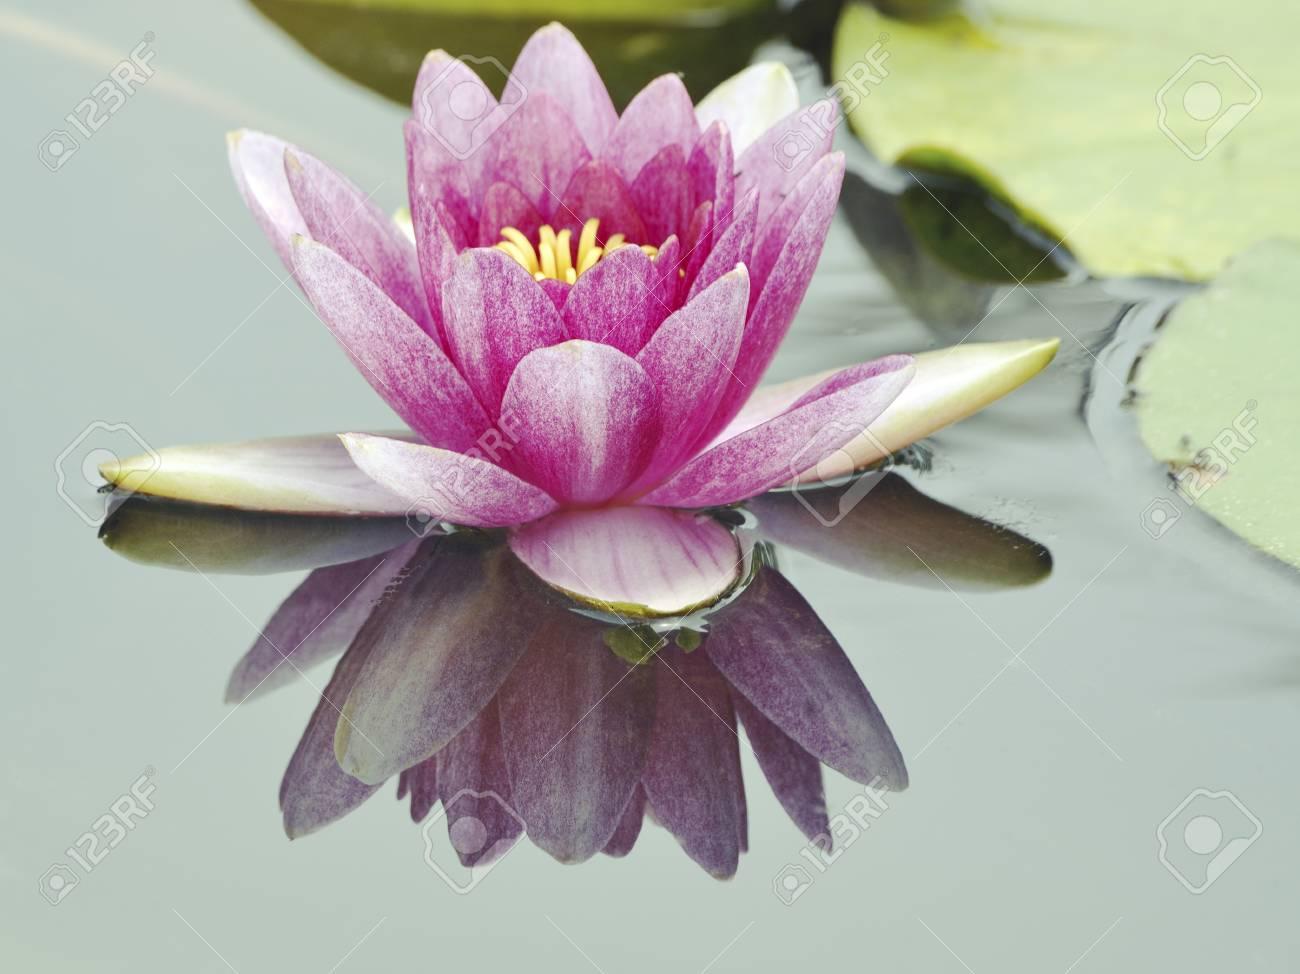 Light Key Image Of Blossom Lotus Flower In Japanese Pond Focus